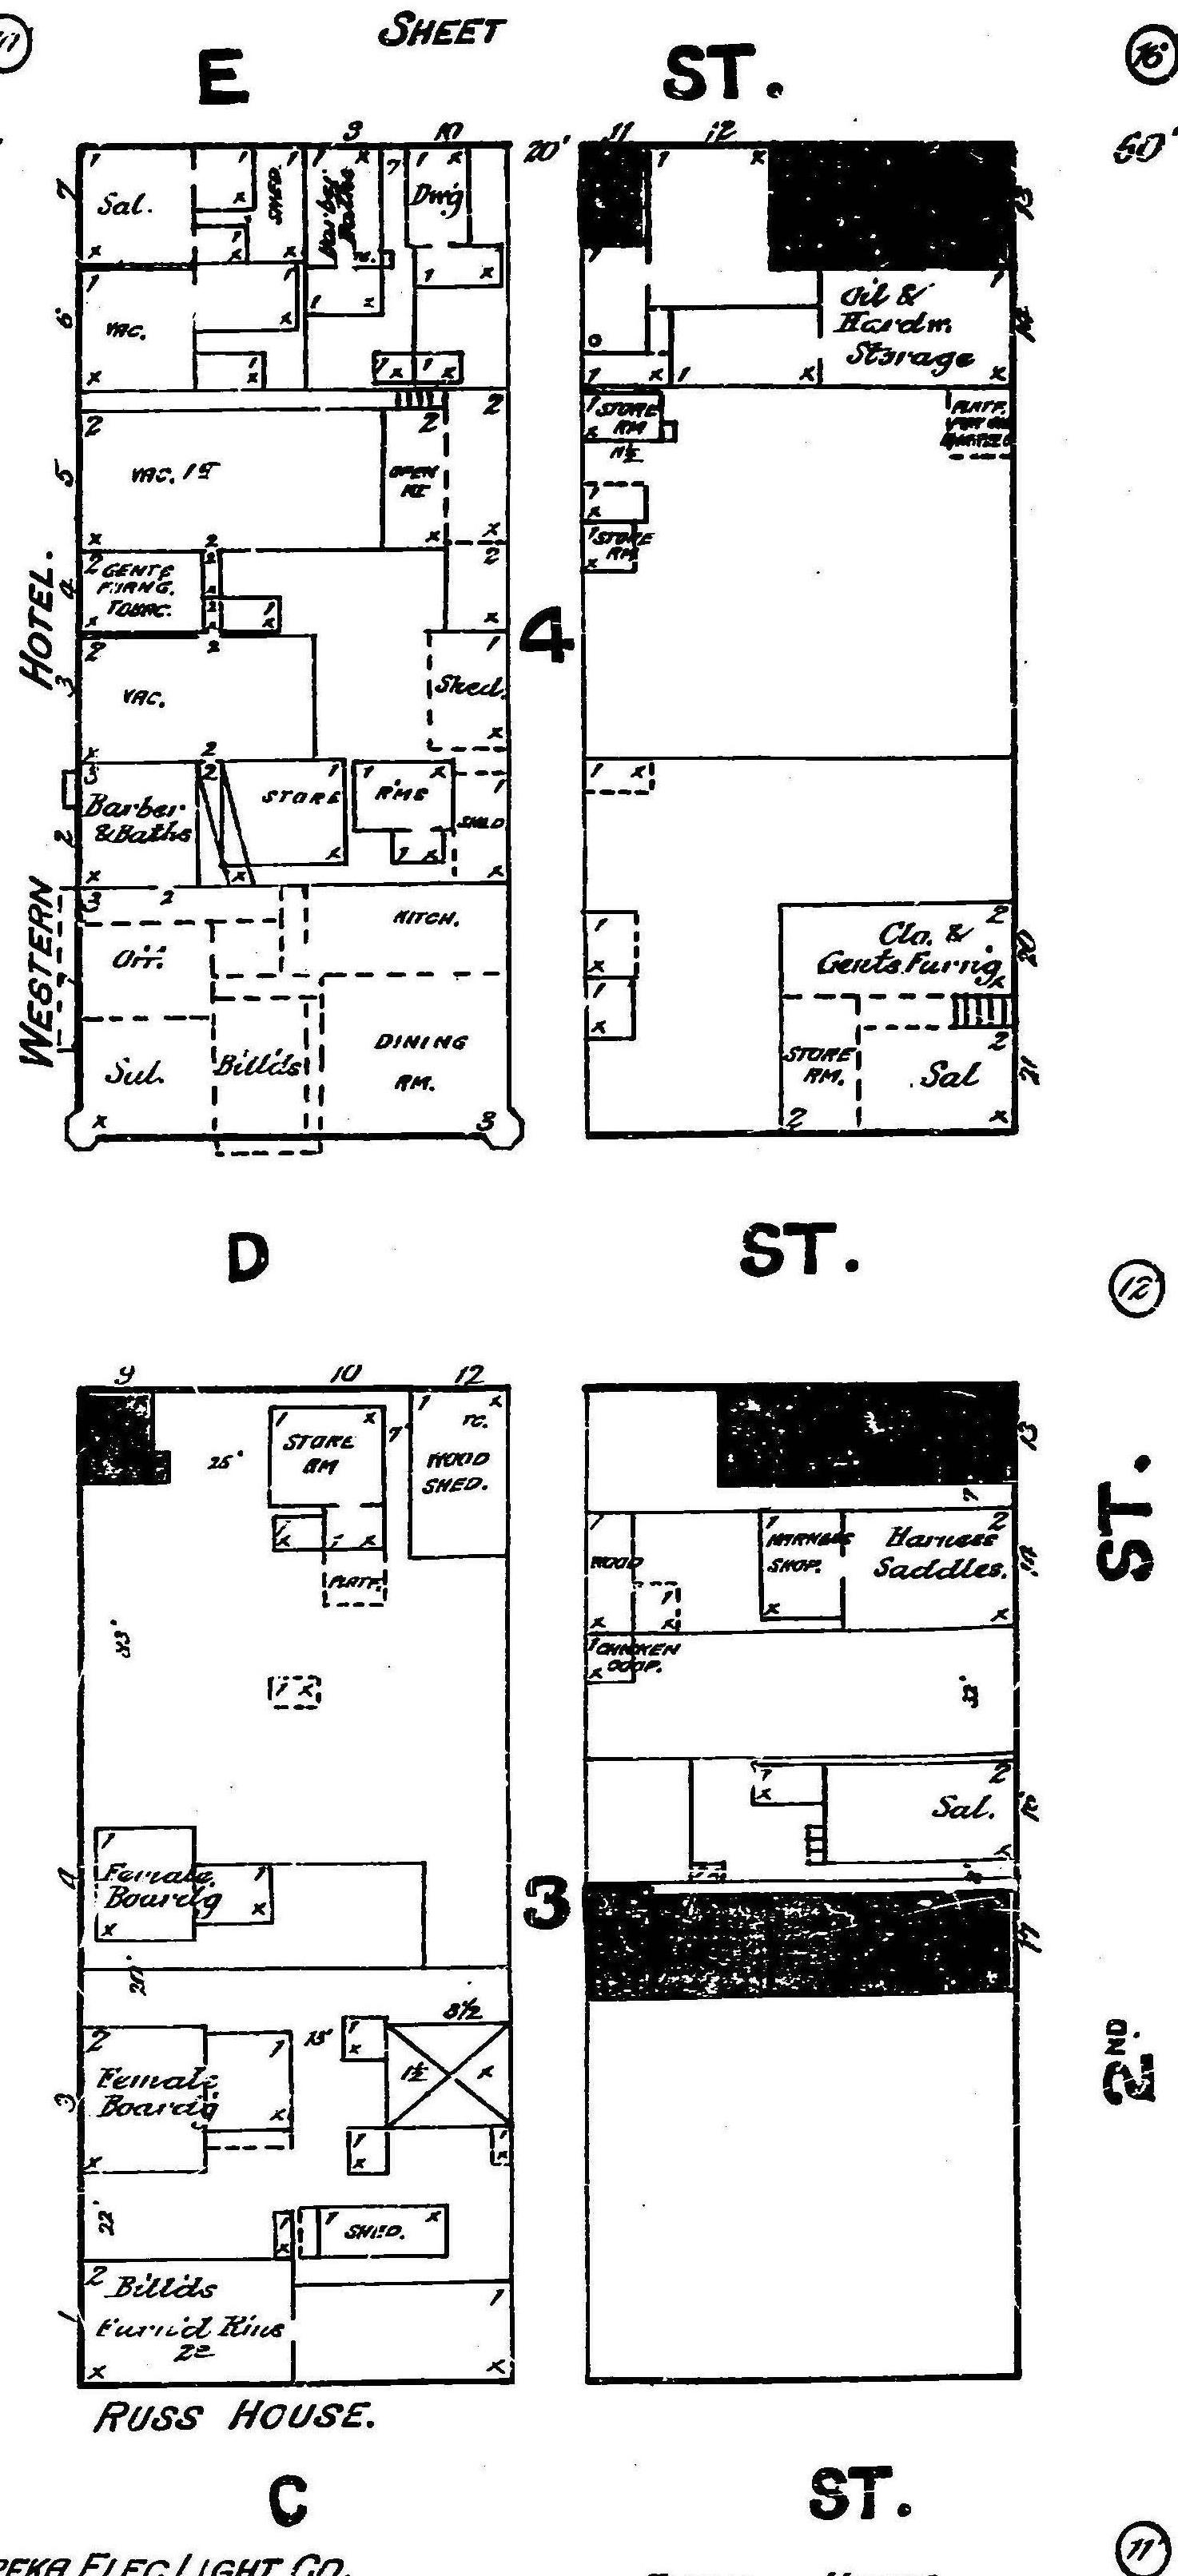 Eureka.Sanborn.1889_002_PAGE 2.C-E.1st-3rd